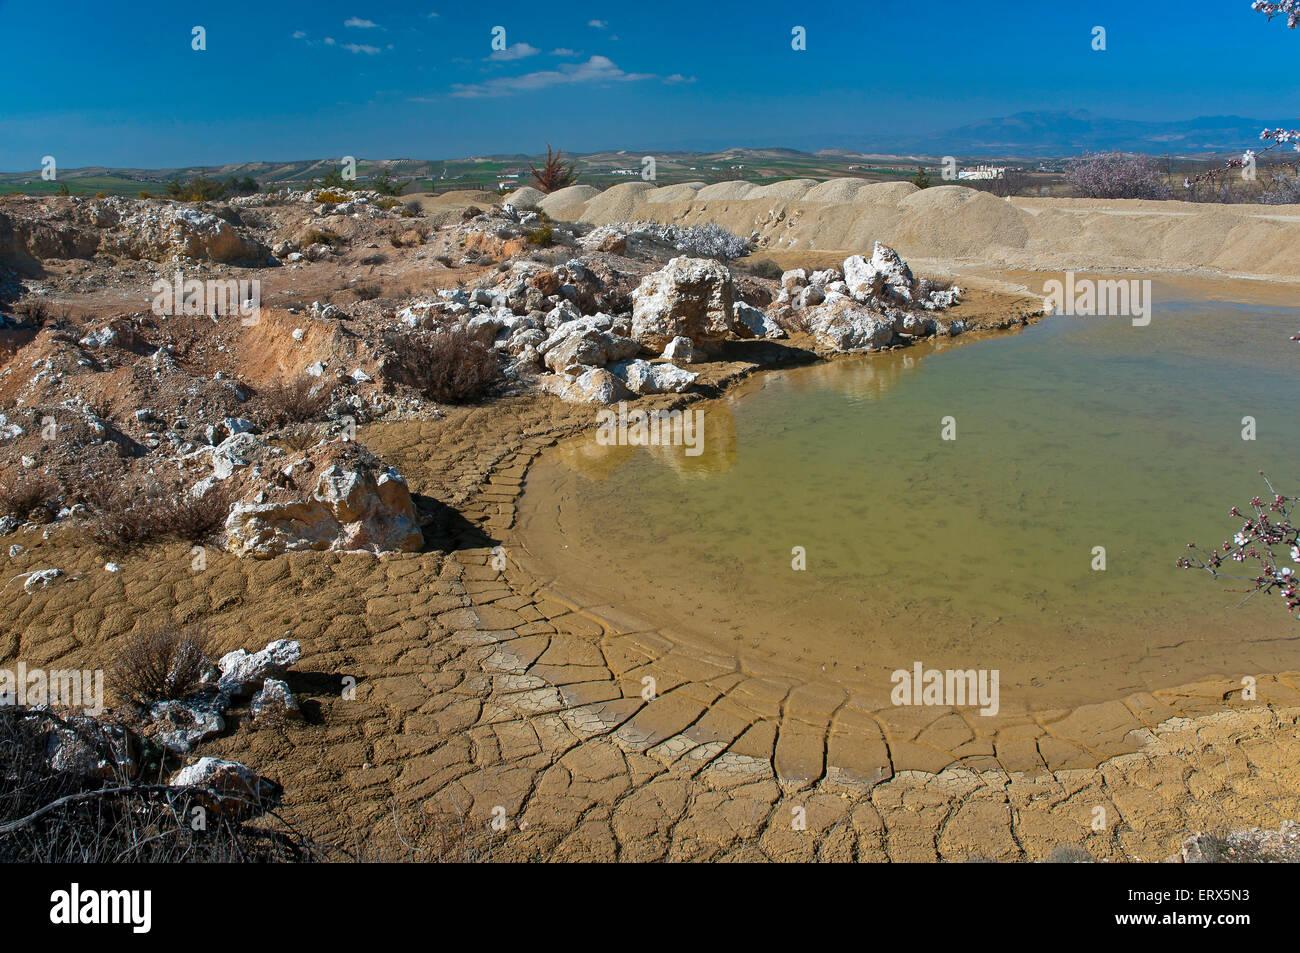 Celestine Mine Solvay, Escuzar, Granada province, Region of Andalusia, Spain, Europe - Stock Image